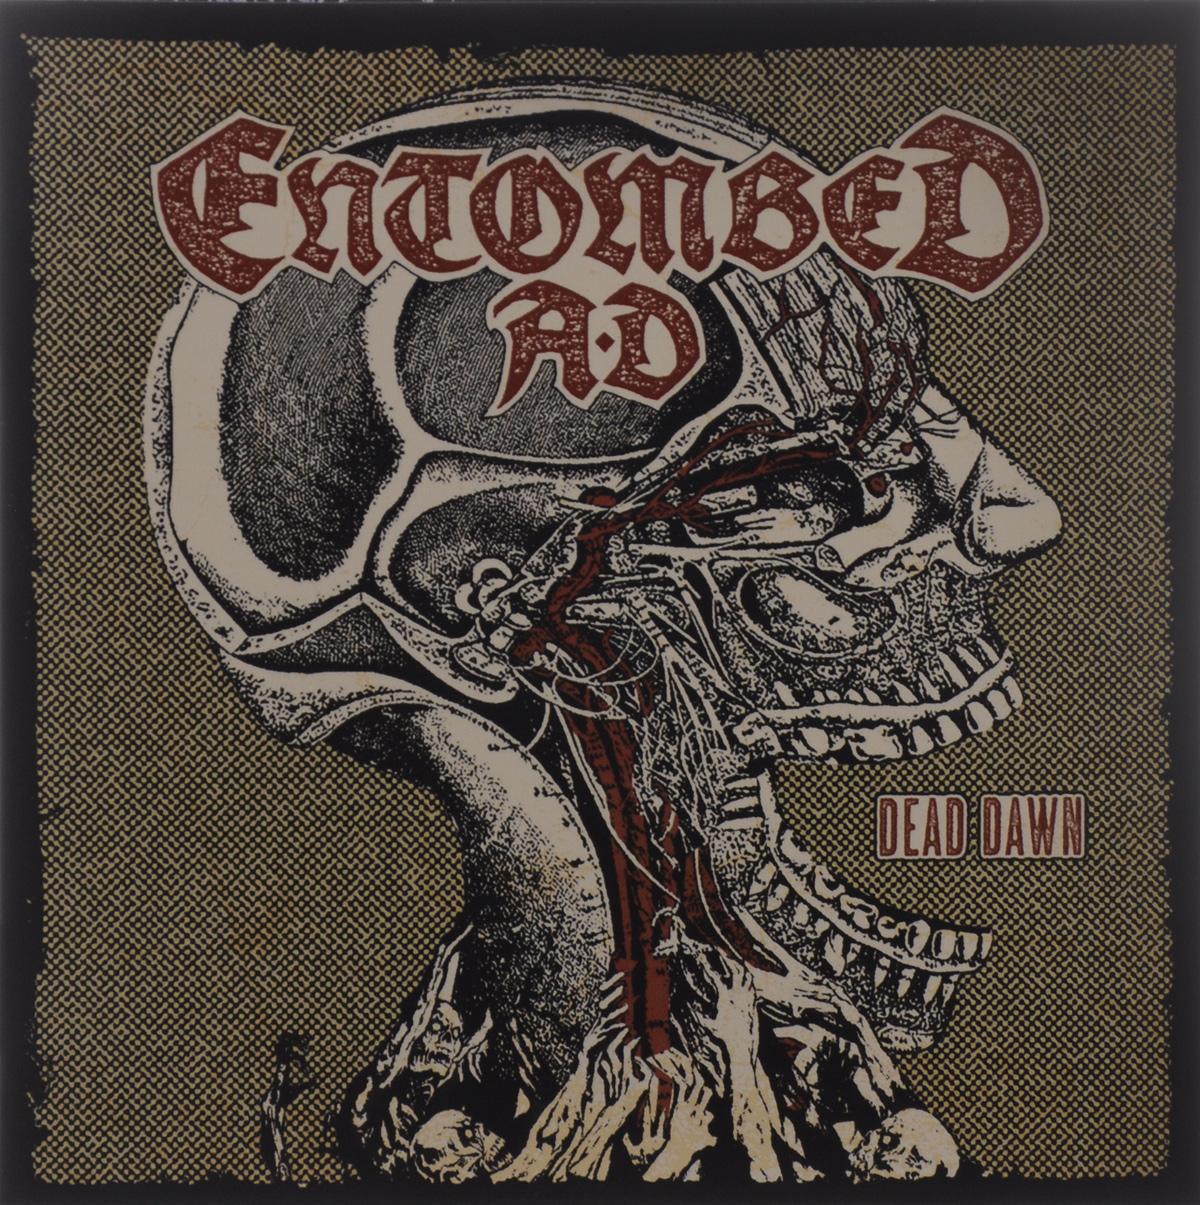 Entombed A.D. Entombed A.D. Dead Dawn entombed a d entombed a d dead dawn audio mc